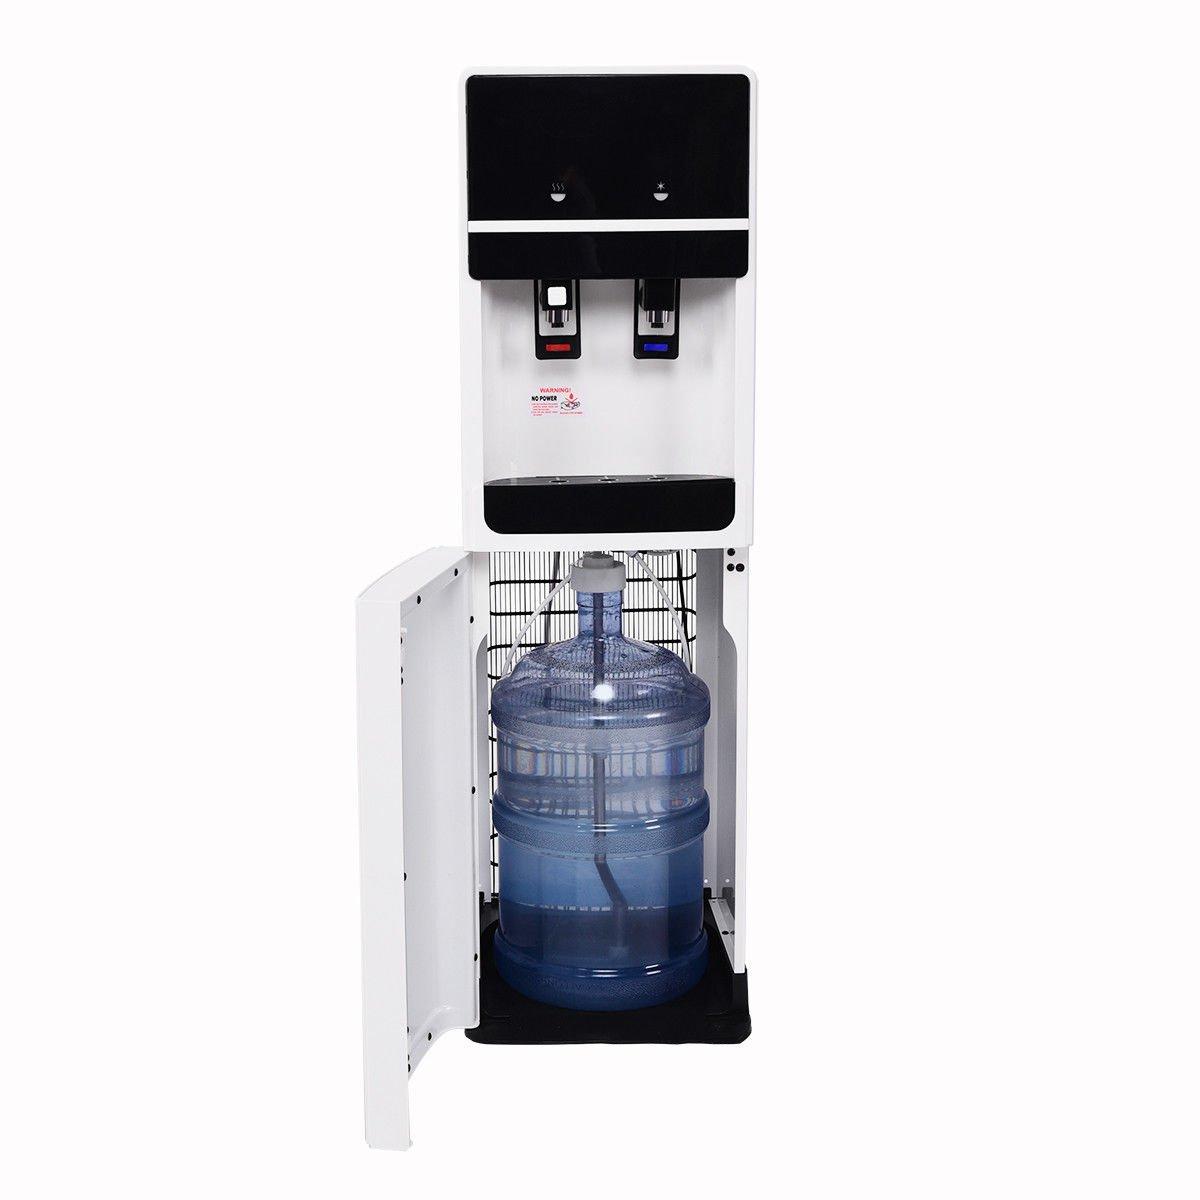 Costway Bottom Loading Water Cooler Dispenser Underlying Stainless Steel Water Cooler Dispenser Cold Hot 5 Gallon Home Office